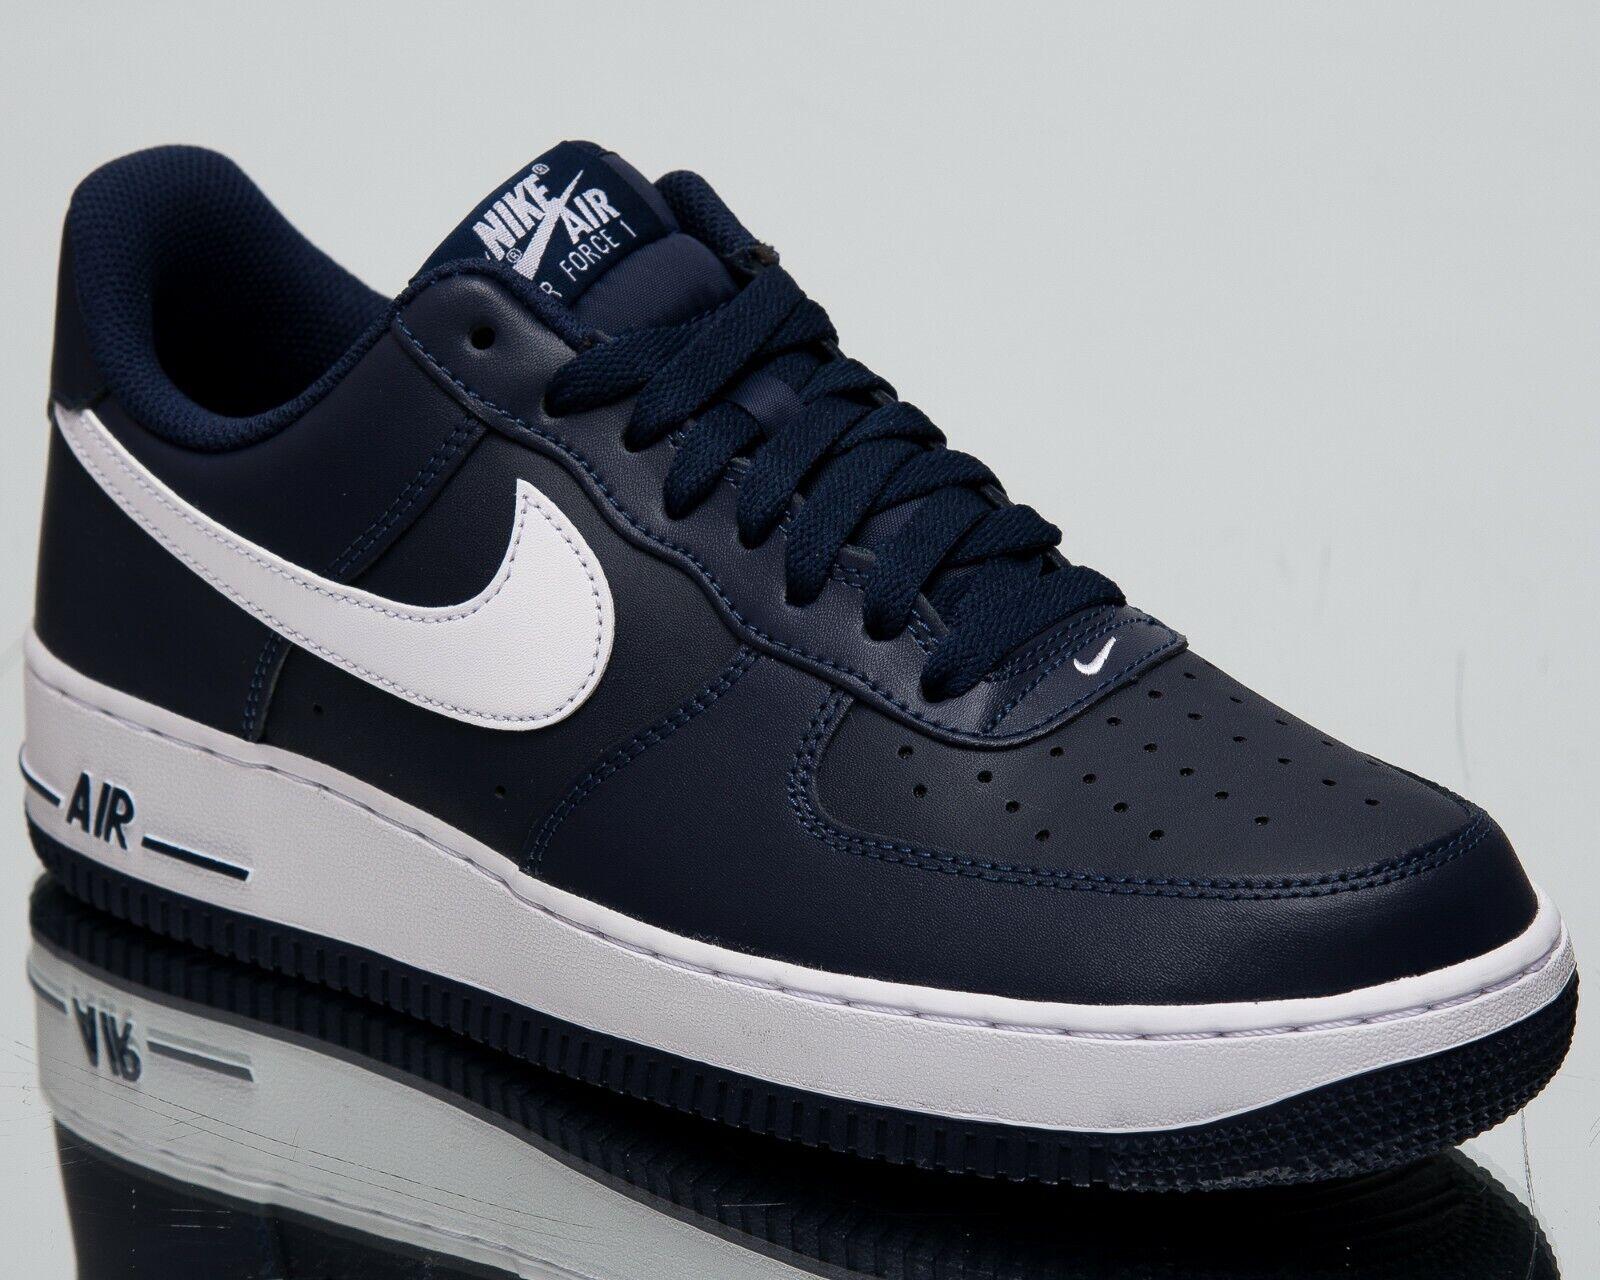 Nike Air Force 1 Low New Uomo Lifestyle scarpe scarpe scarpe Midnight Navy bianca 488298-436 33d05a